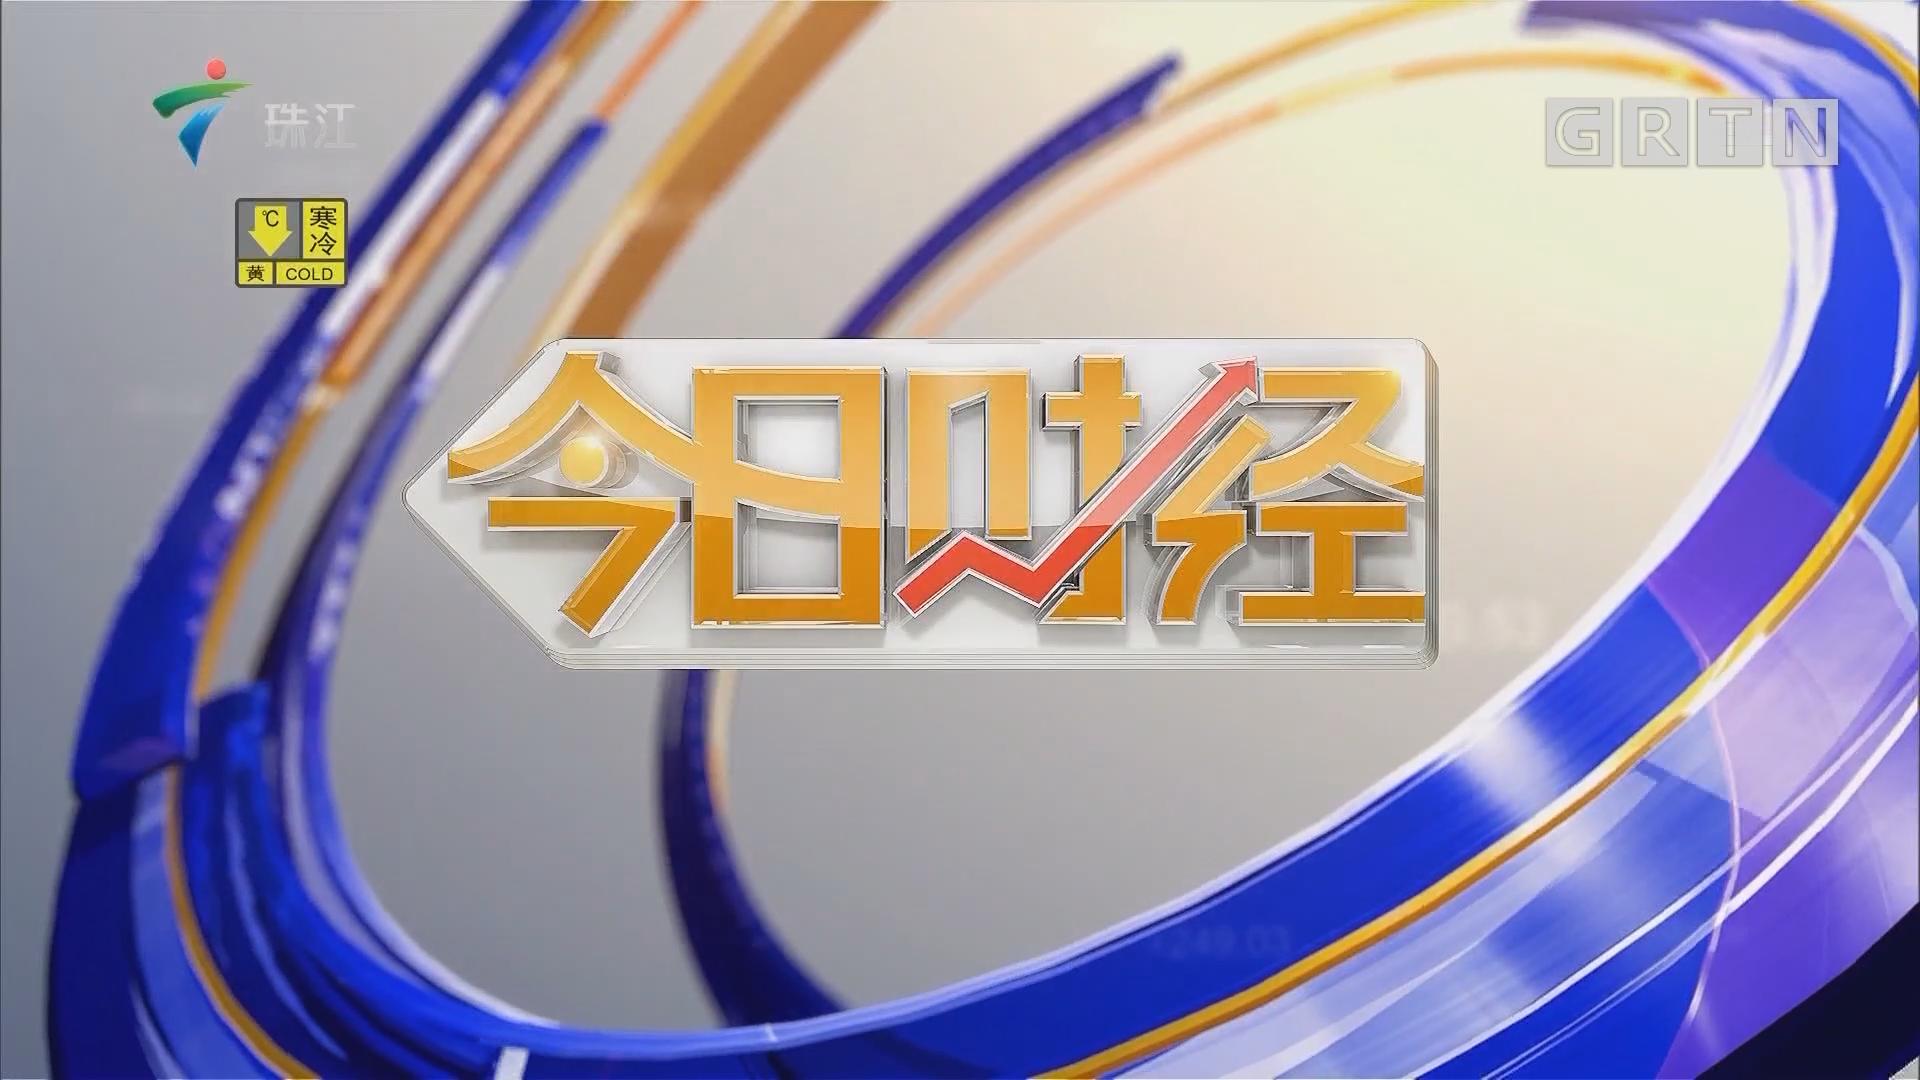 [HD][2018-12-14]今日财经:集聚三地创新要素 广州科创企业强劲崛起